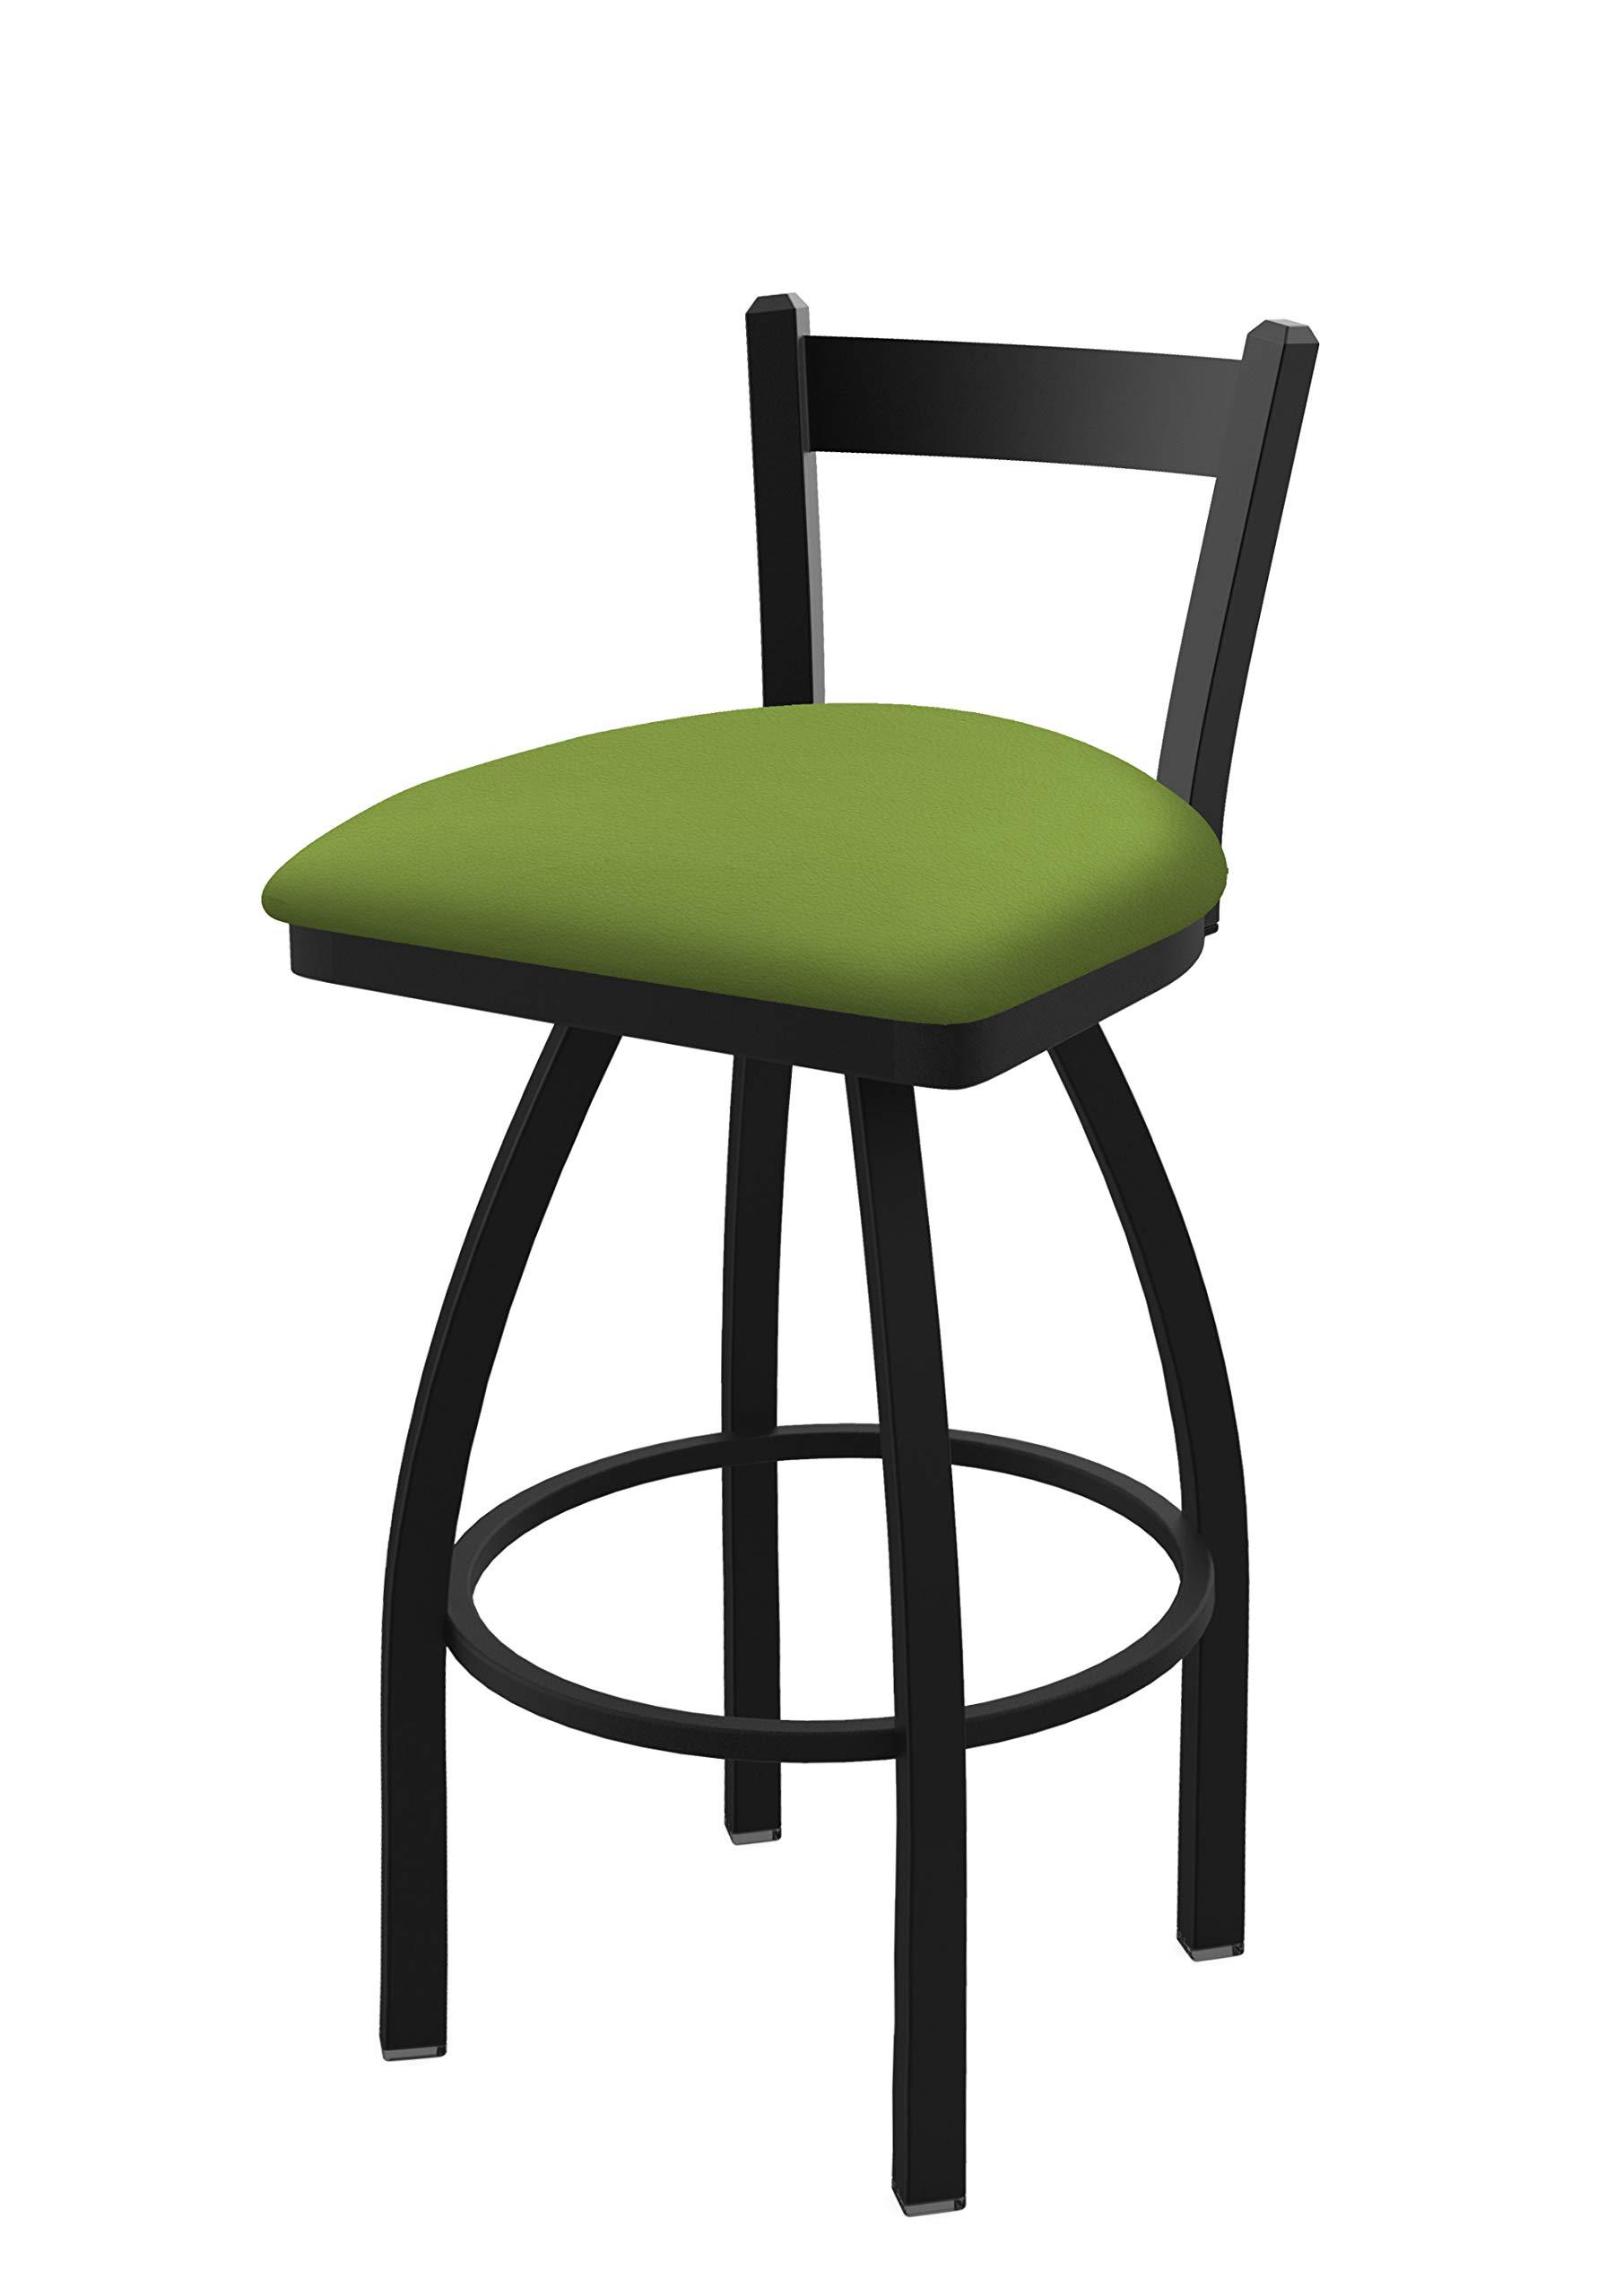 Holland Bar Stool Co. 82125BW009 821 Catalina 25'' Low Back Swivel Counter Black Wrinkle Finish and Canter Kiwi Green Seat Bar Stool,